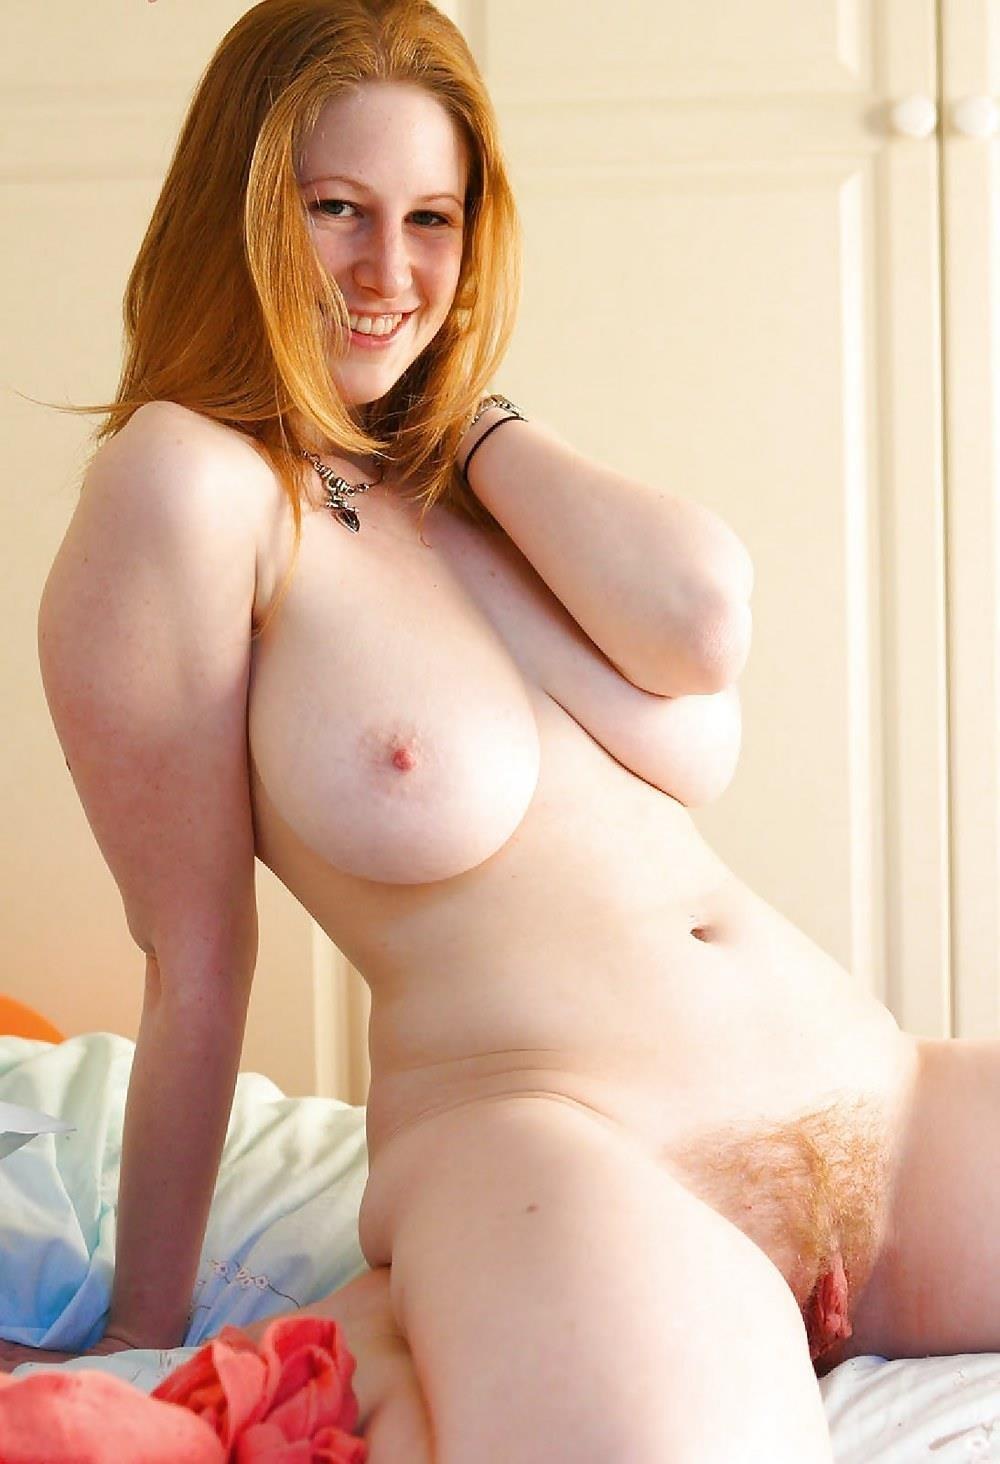 Nude hairy redhead pics-7185